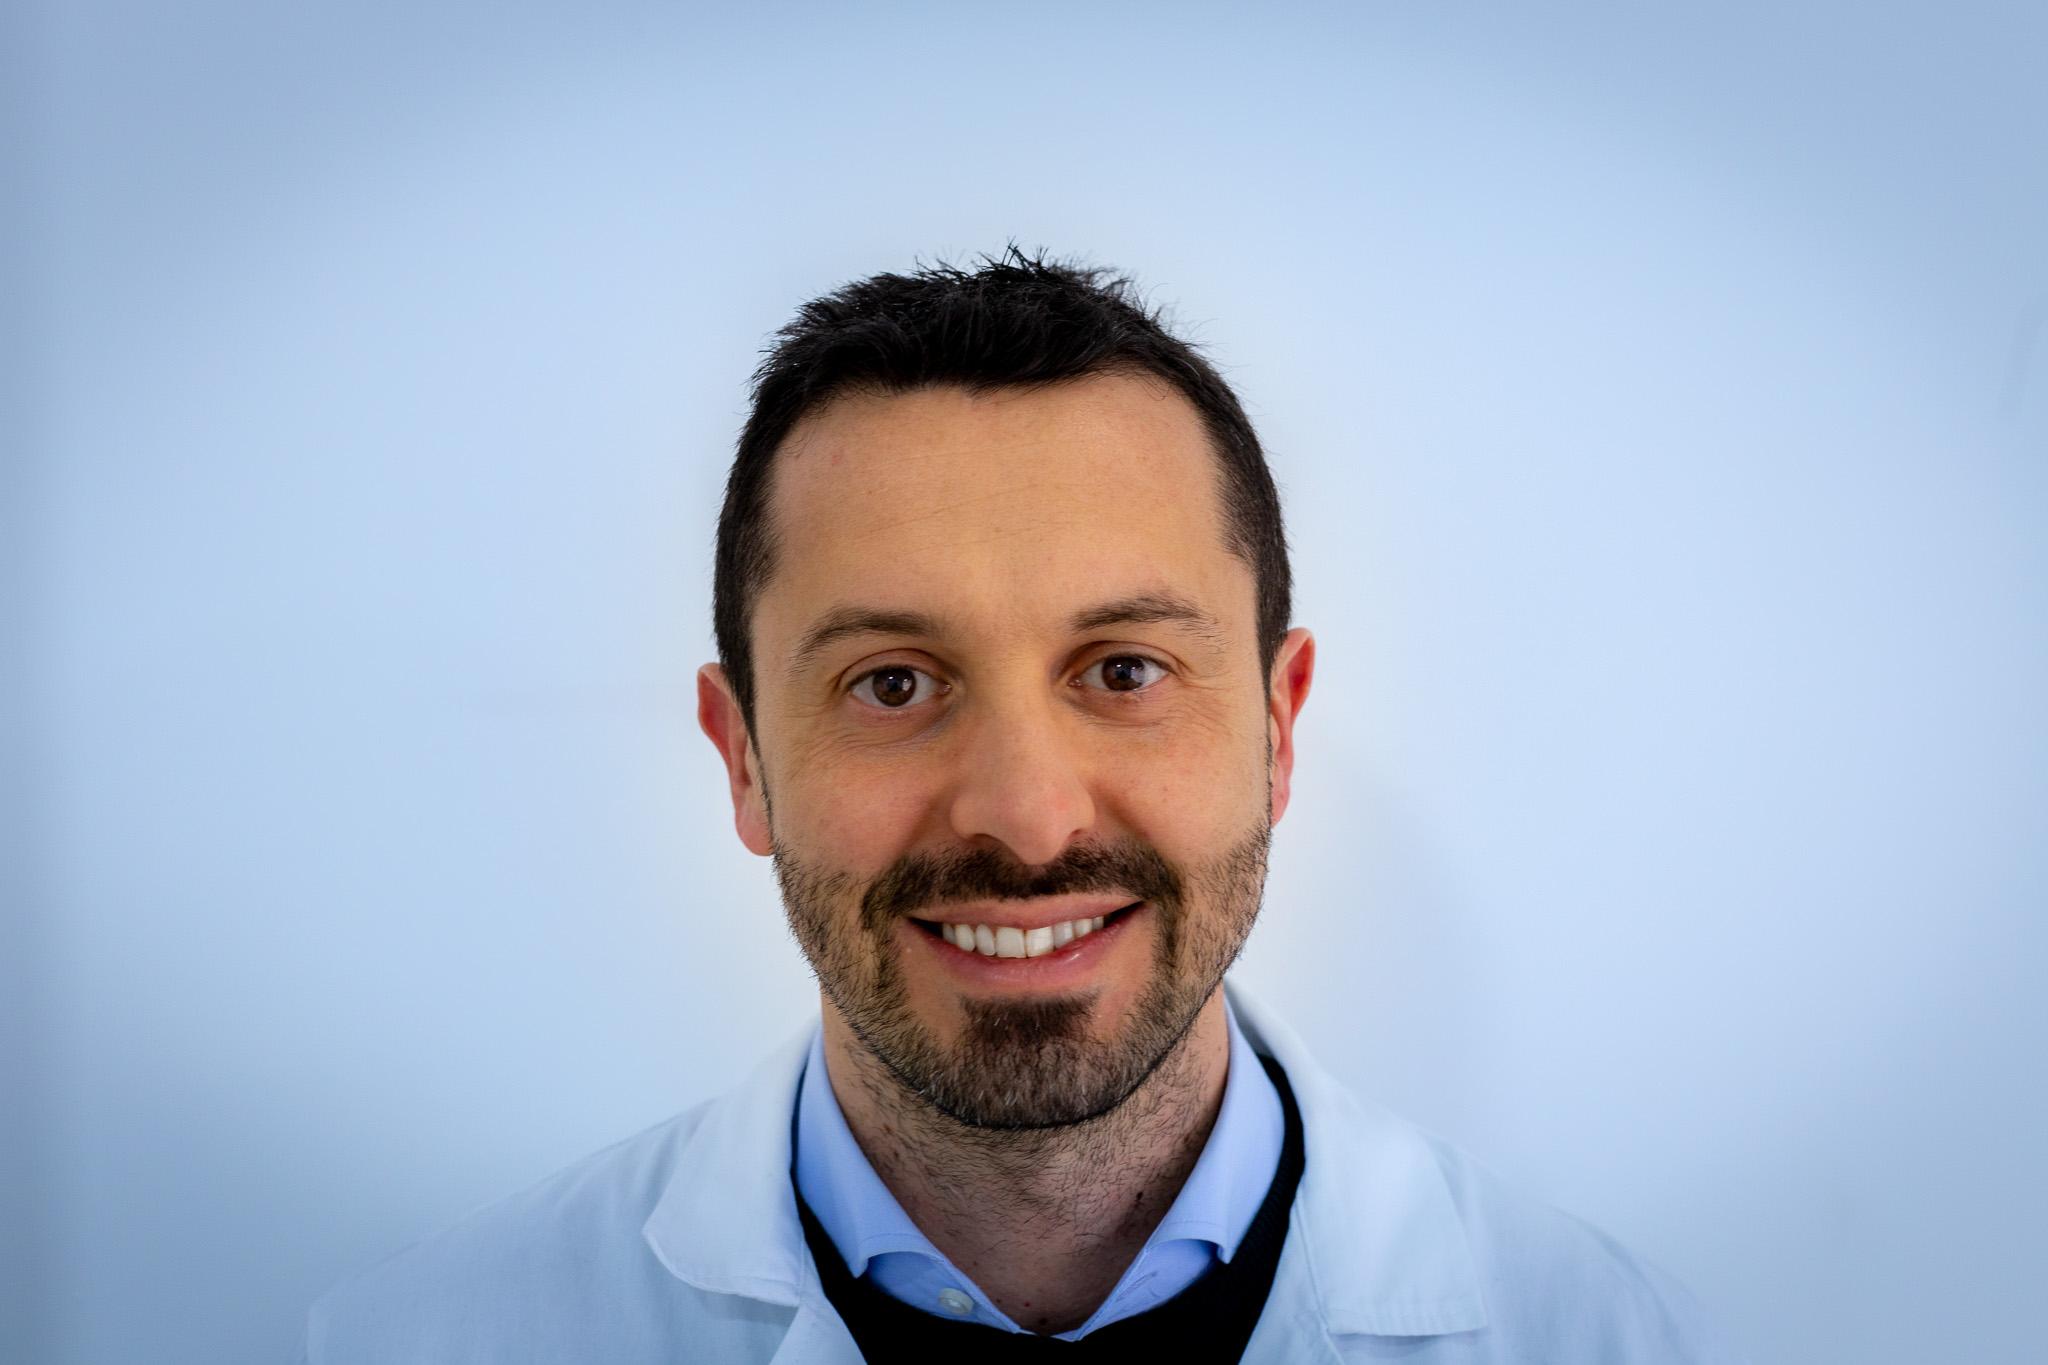 Dott._Fabio_Ioannilli_Polimedica_Favino